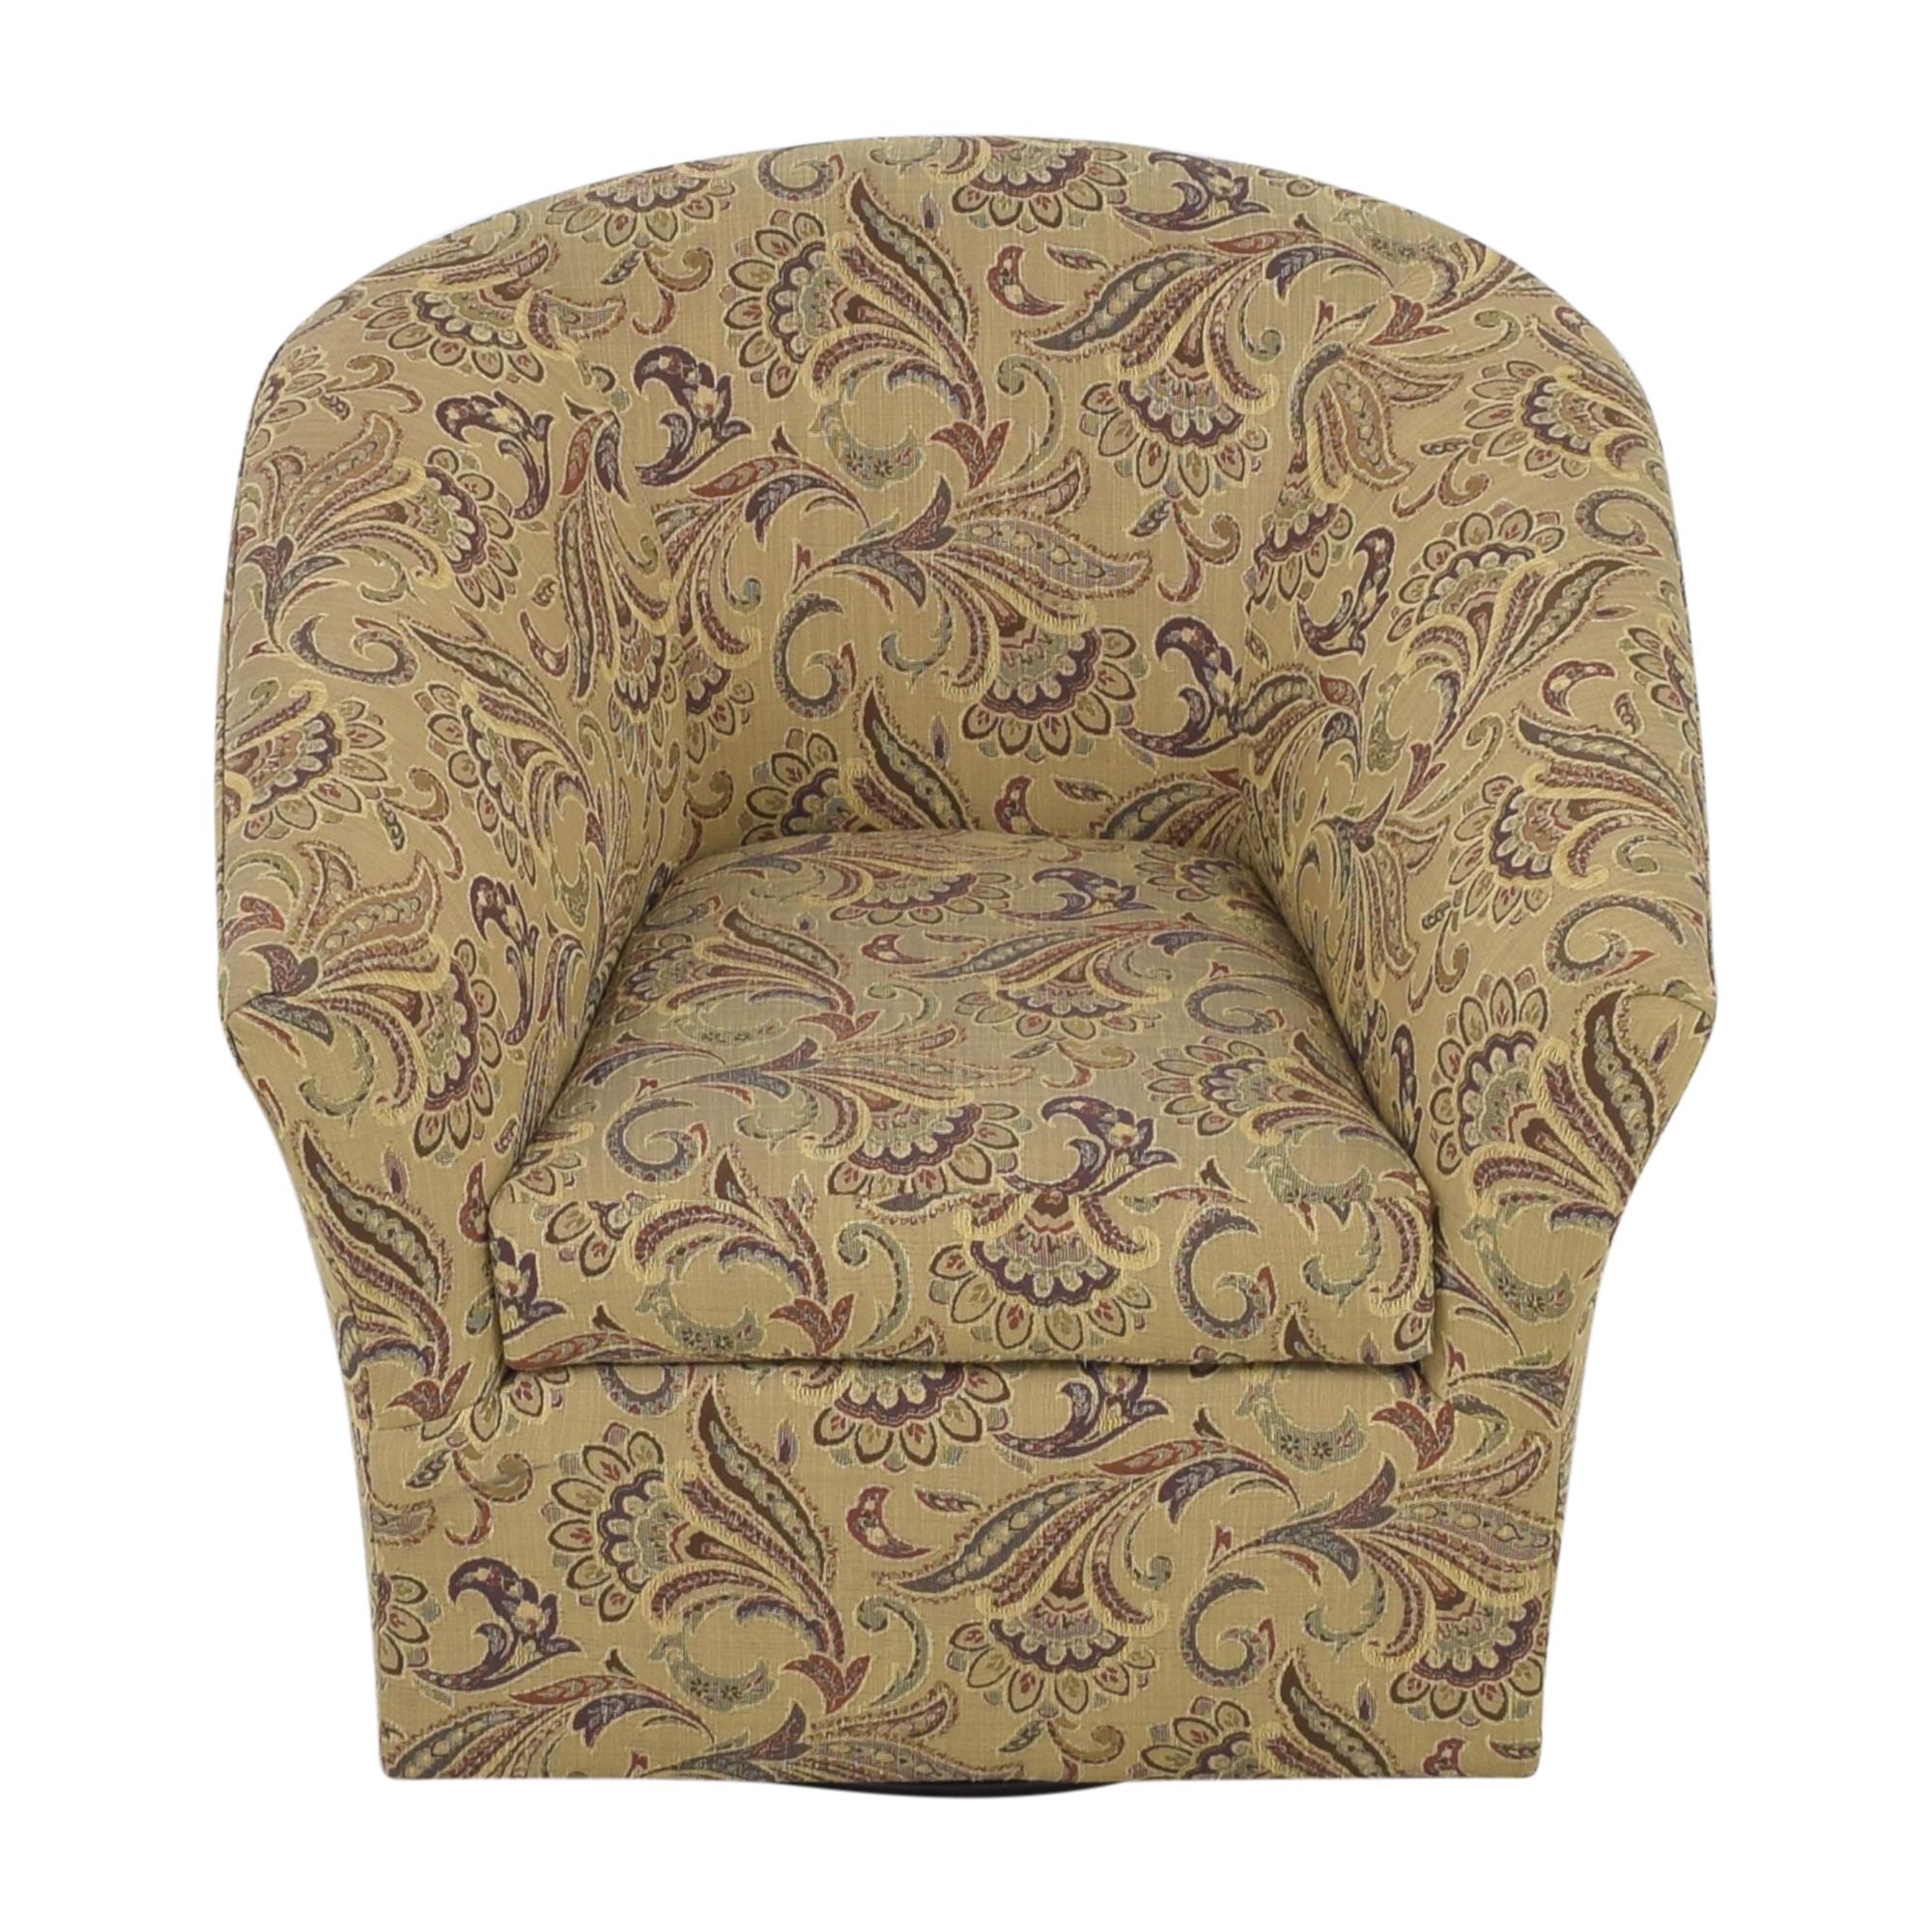 shop Hooker Furniture Sam Moore Swivel Accent Chair Hooker Furniture Accent Chairs